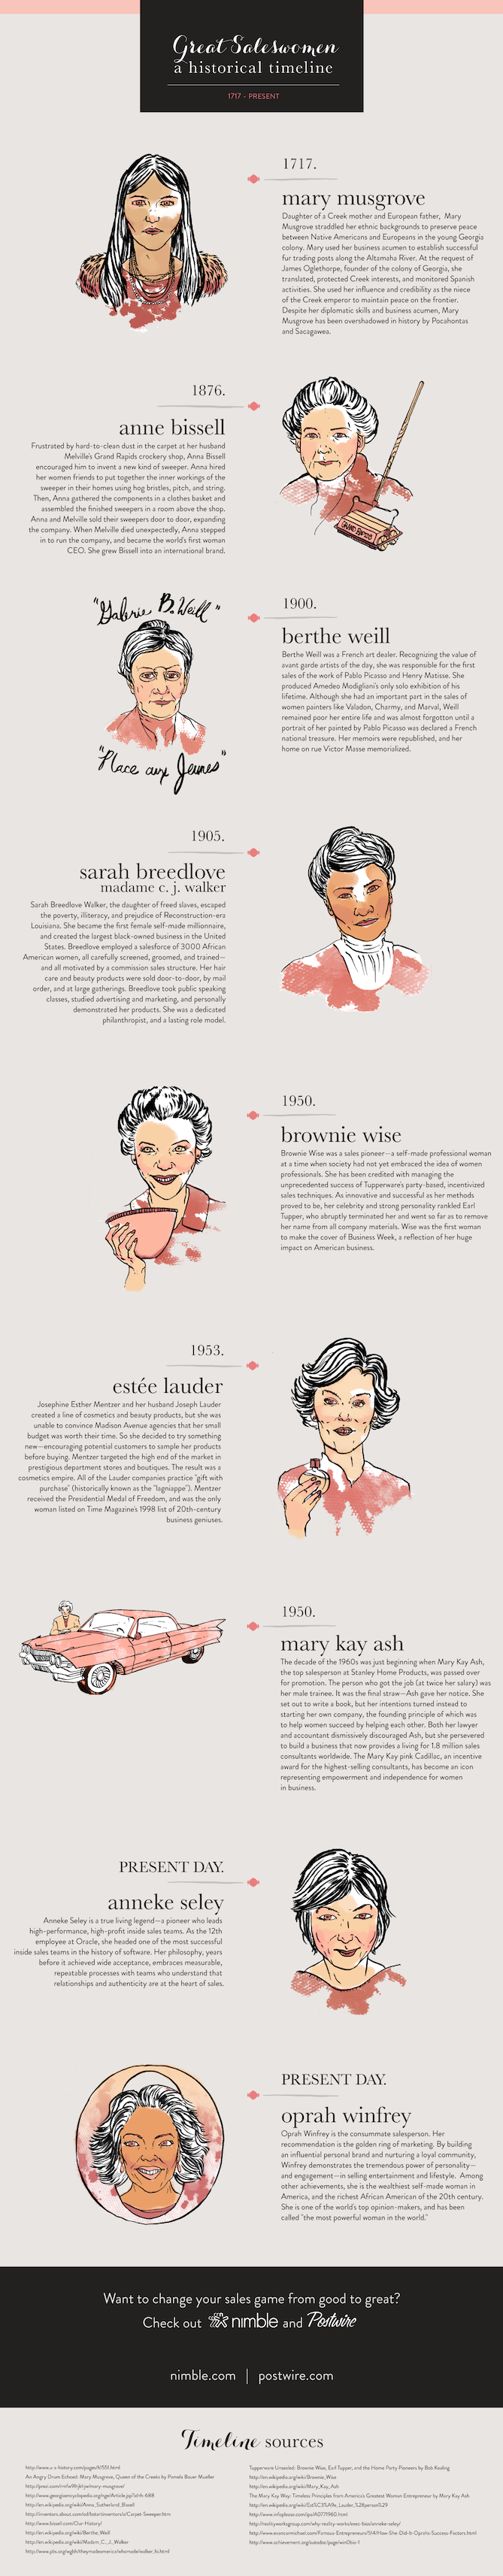 great-saleswomen-infographic.png